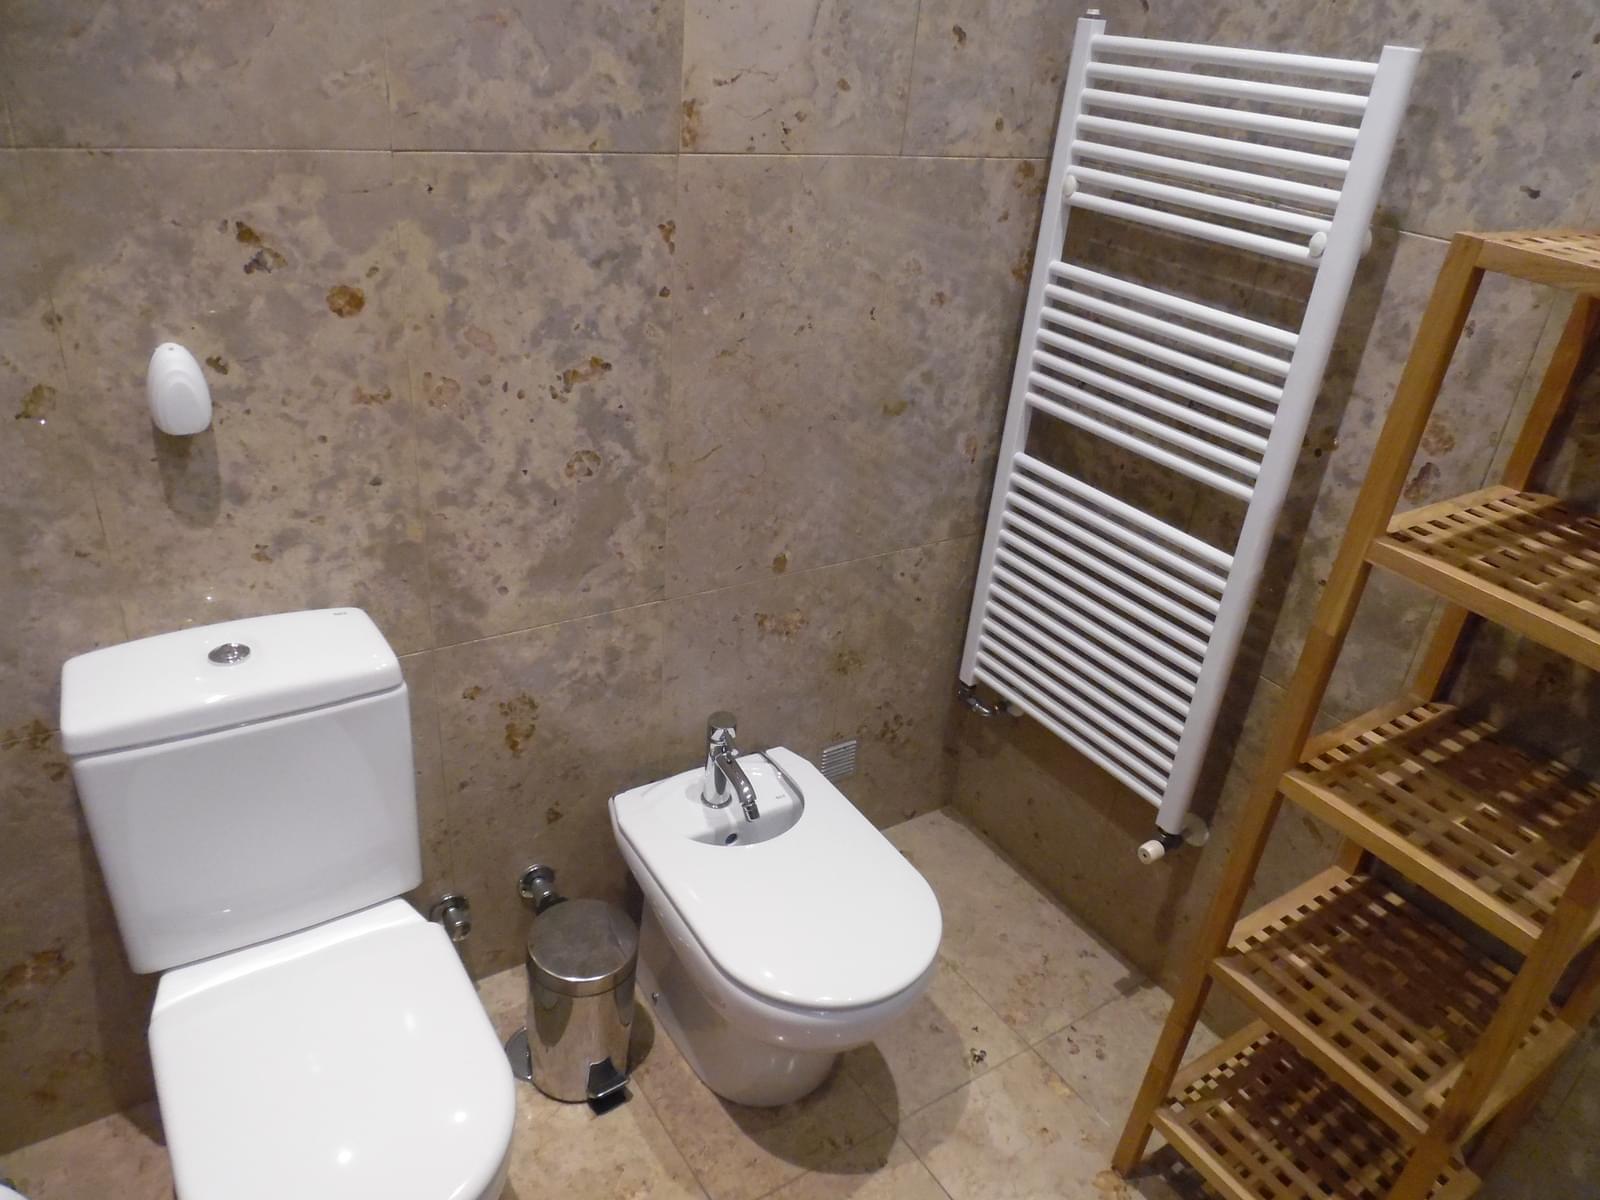 pf16905-apartamento-t1-lisboa-3bcac279-6e10-4ef1-9f61-5f165beac6eb